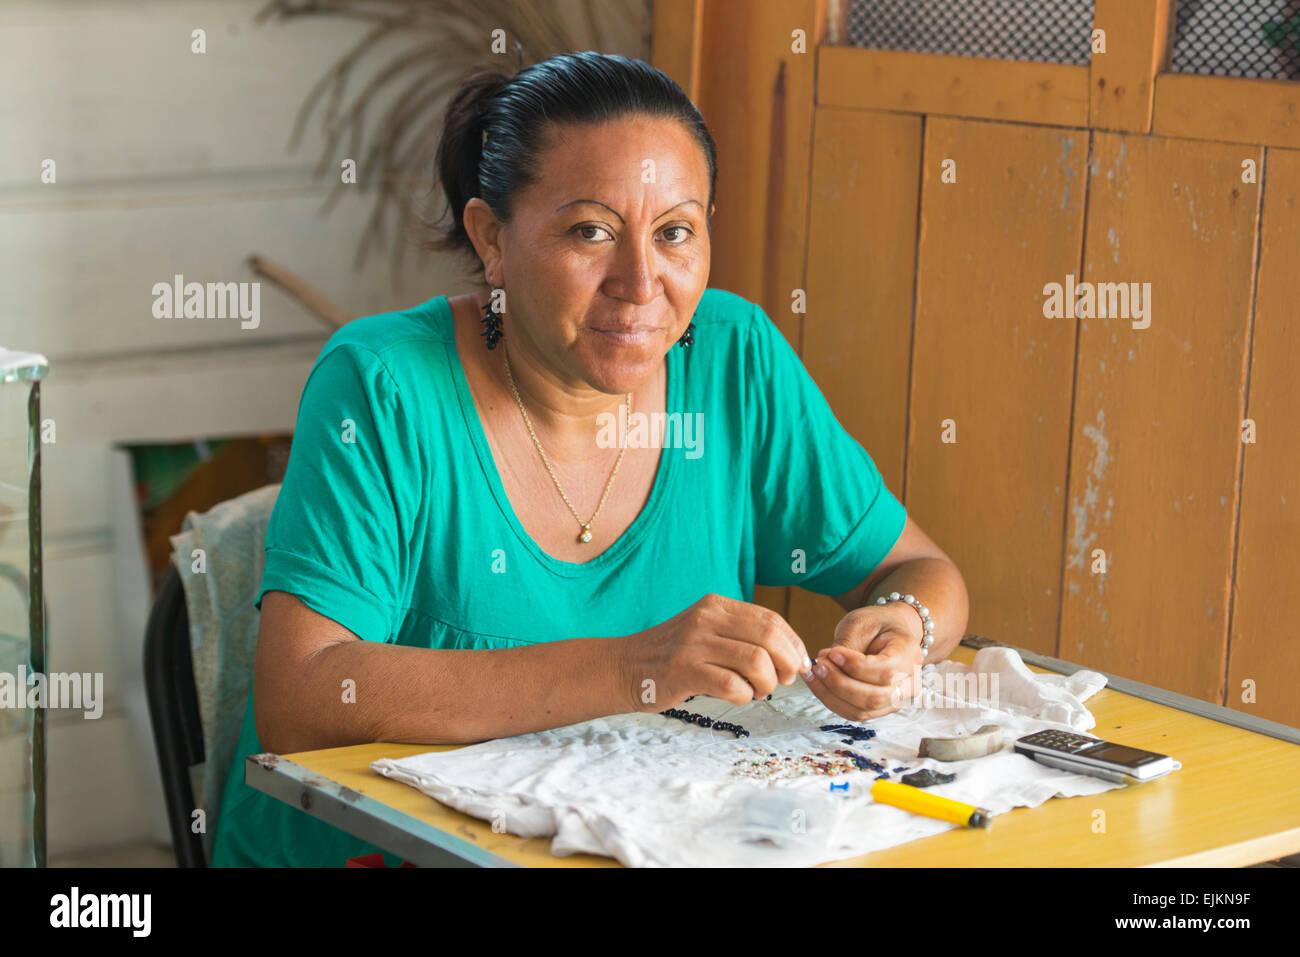 Amerindian woman making jewellery, Galibi, Suriname - Stock Image